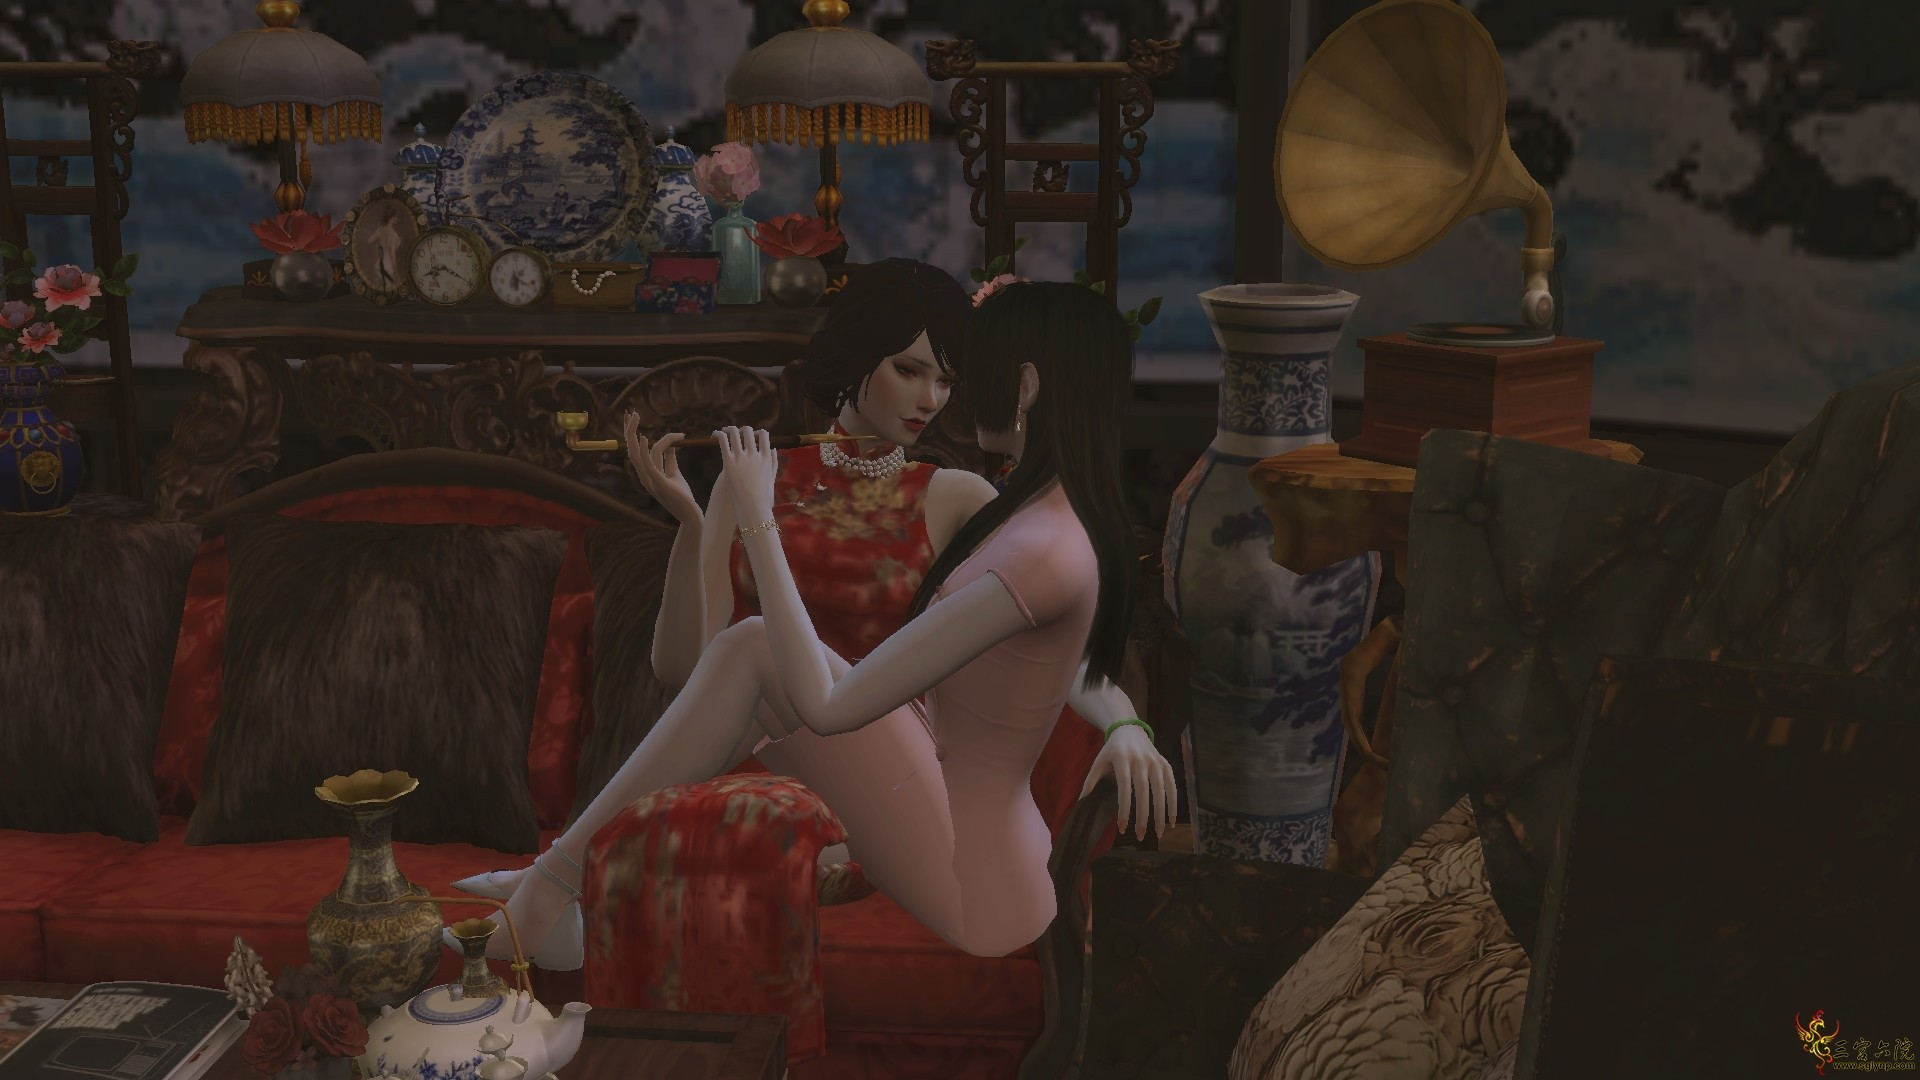 The Sims 4 2020_5_31 22_10_50_副本.jpg